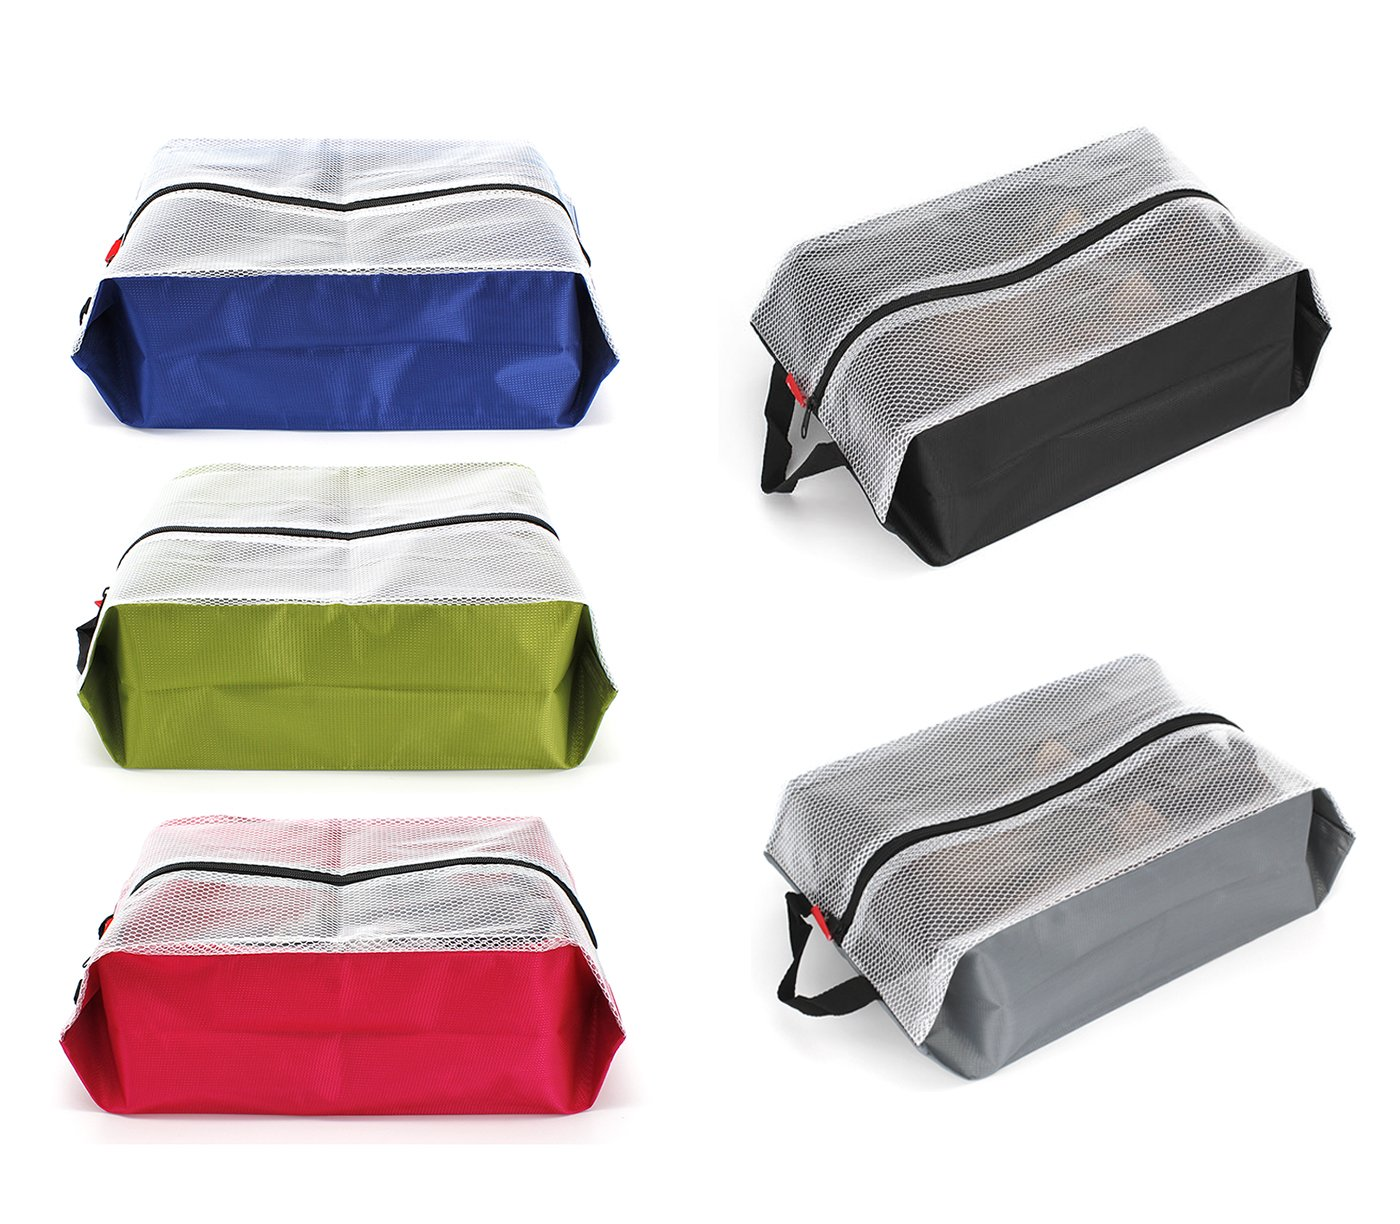 LETLAX Travel Shoe Bags Waterproof Nylon for Women & Men,Shoe Tote bags for Sport Gym,5 PCS (Multicoloured)